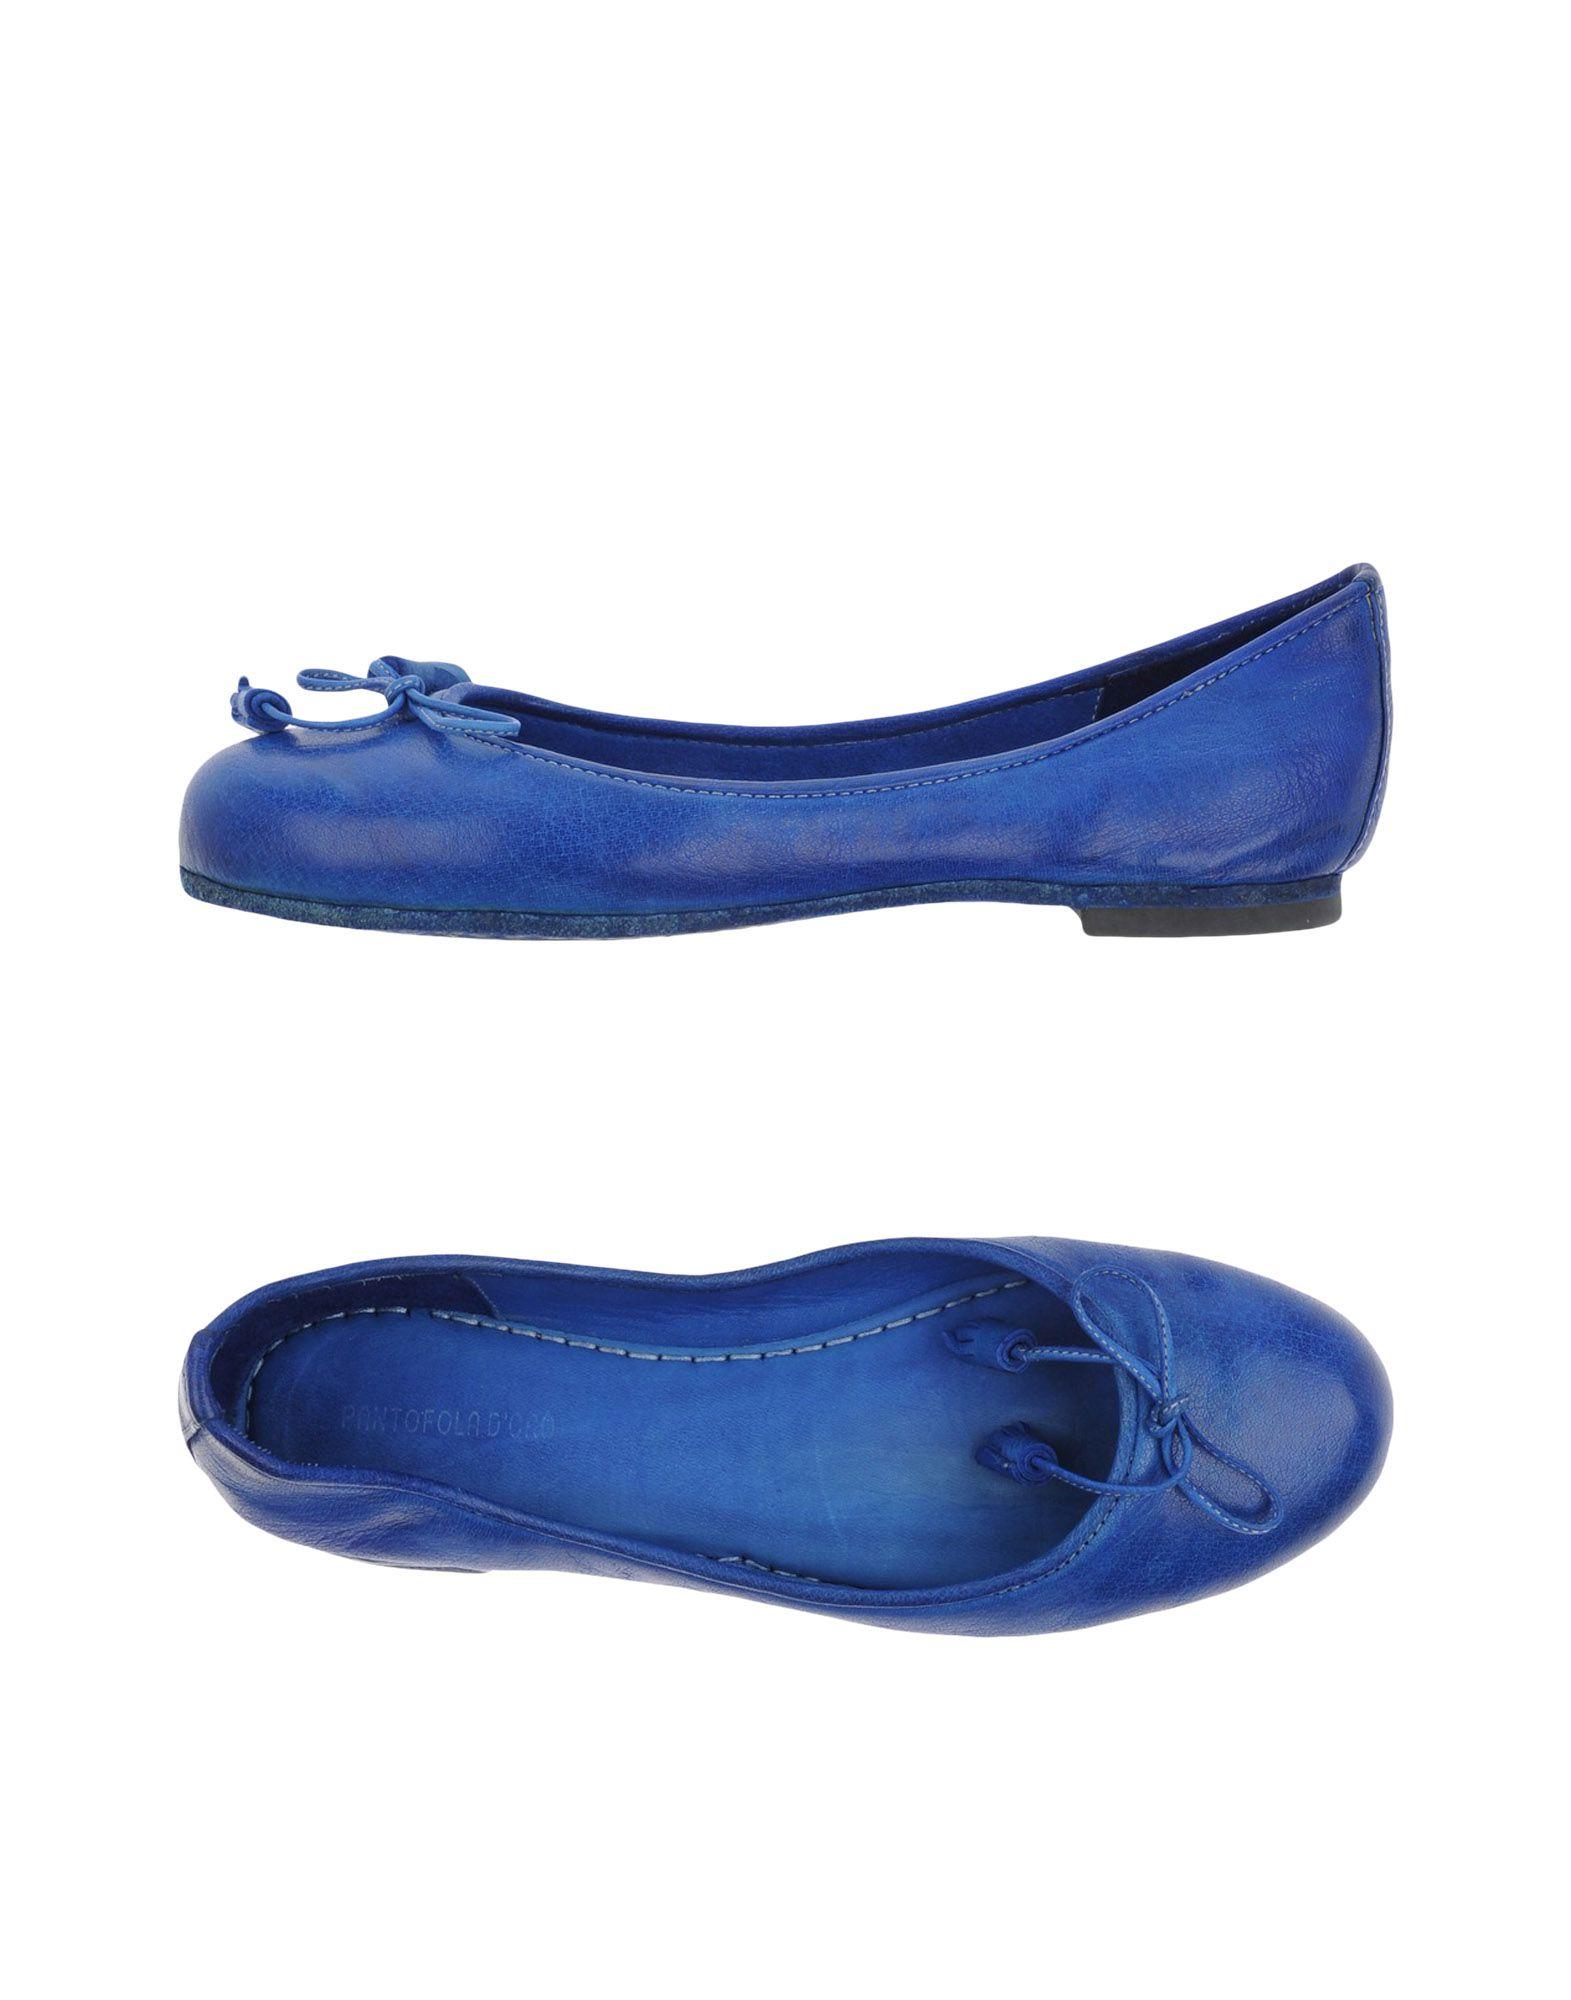 Pantofola Women Ballet D'oro Pantofola D'oro Flats 8vOq6w8Bx